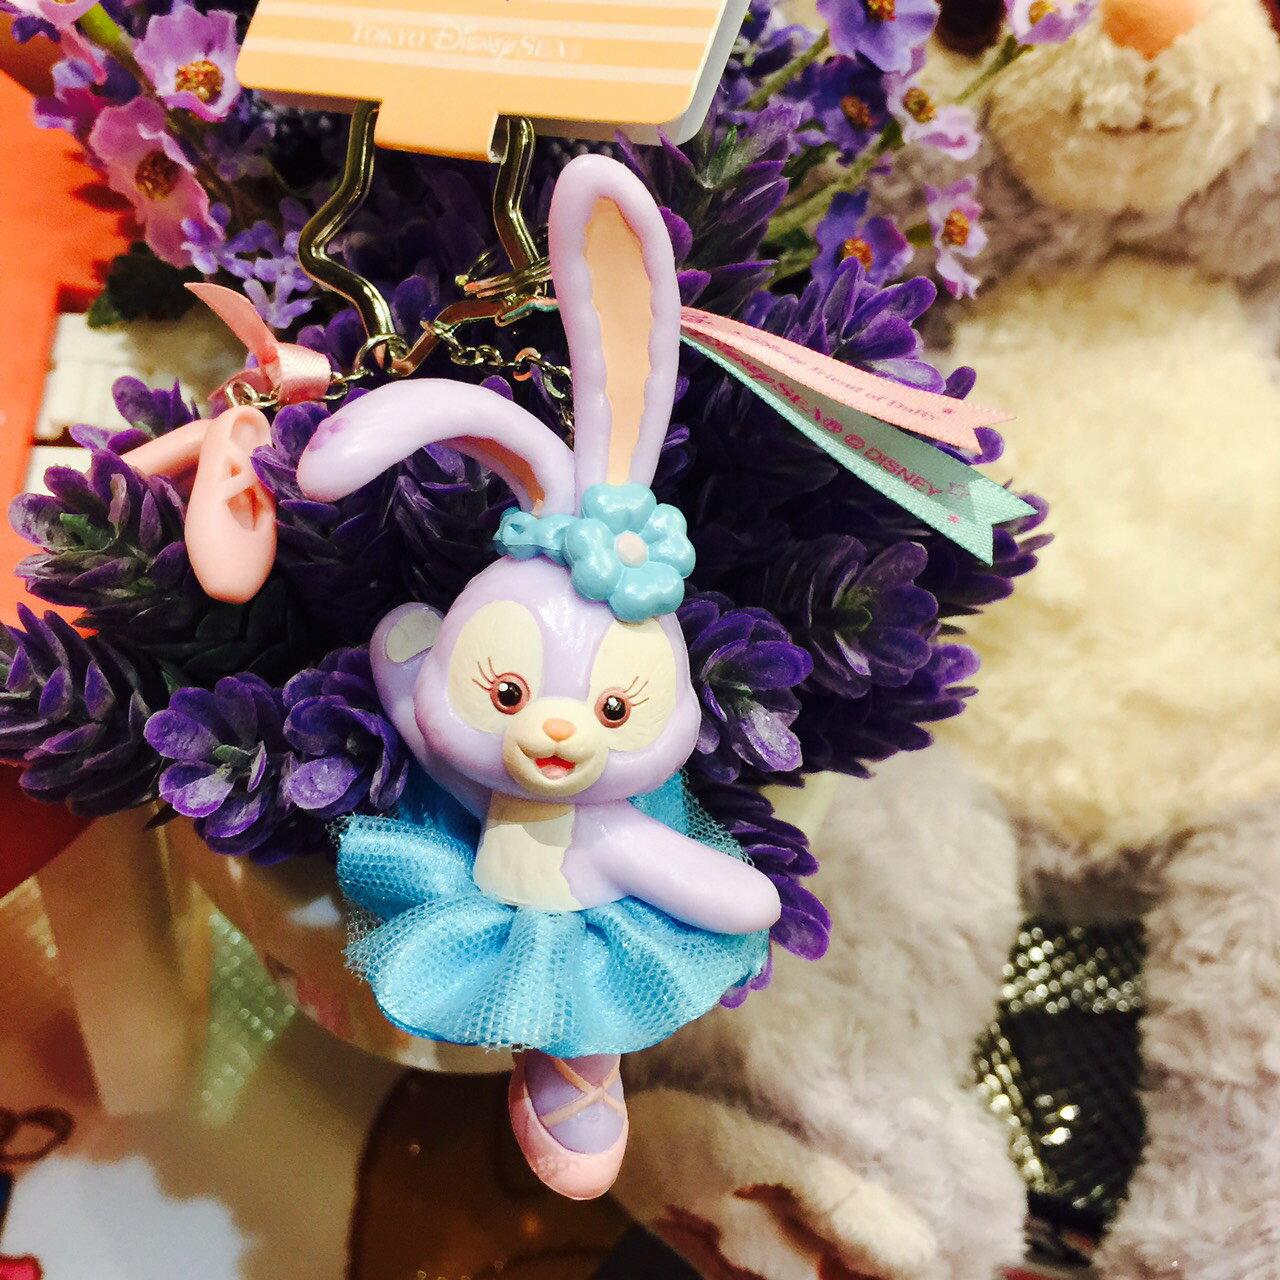 X射線【C918004】日本東京迪士尼代購-史黛拉 Stella Lou 芭蕾鑰匙圈,包包掛飾/鑰匙圈/兔子芭蕾/雪莉玫/達菲/畫家